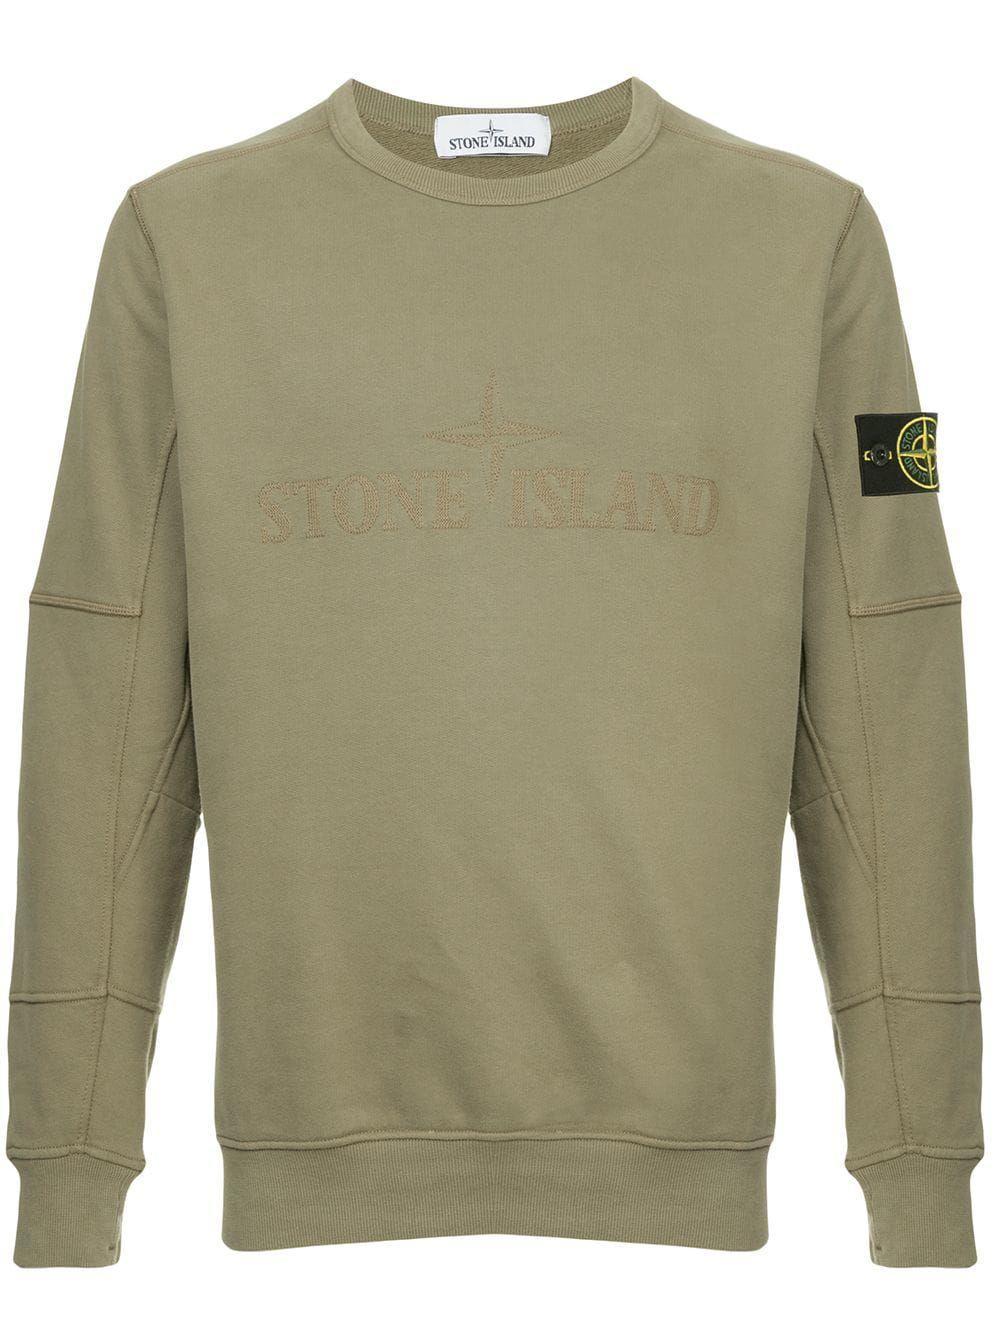 Stone Island Embroidered Logo Sweatshirt In Green Modesens